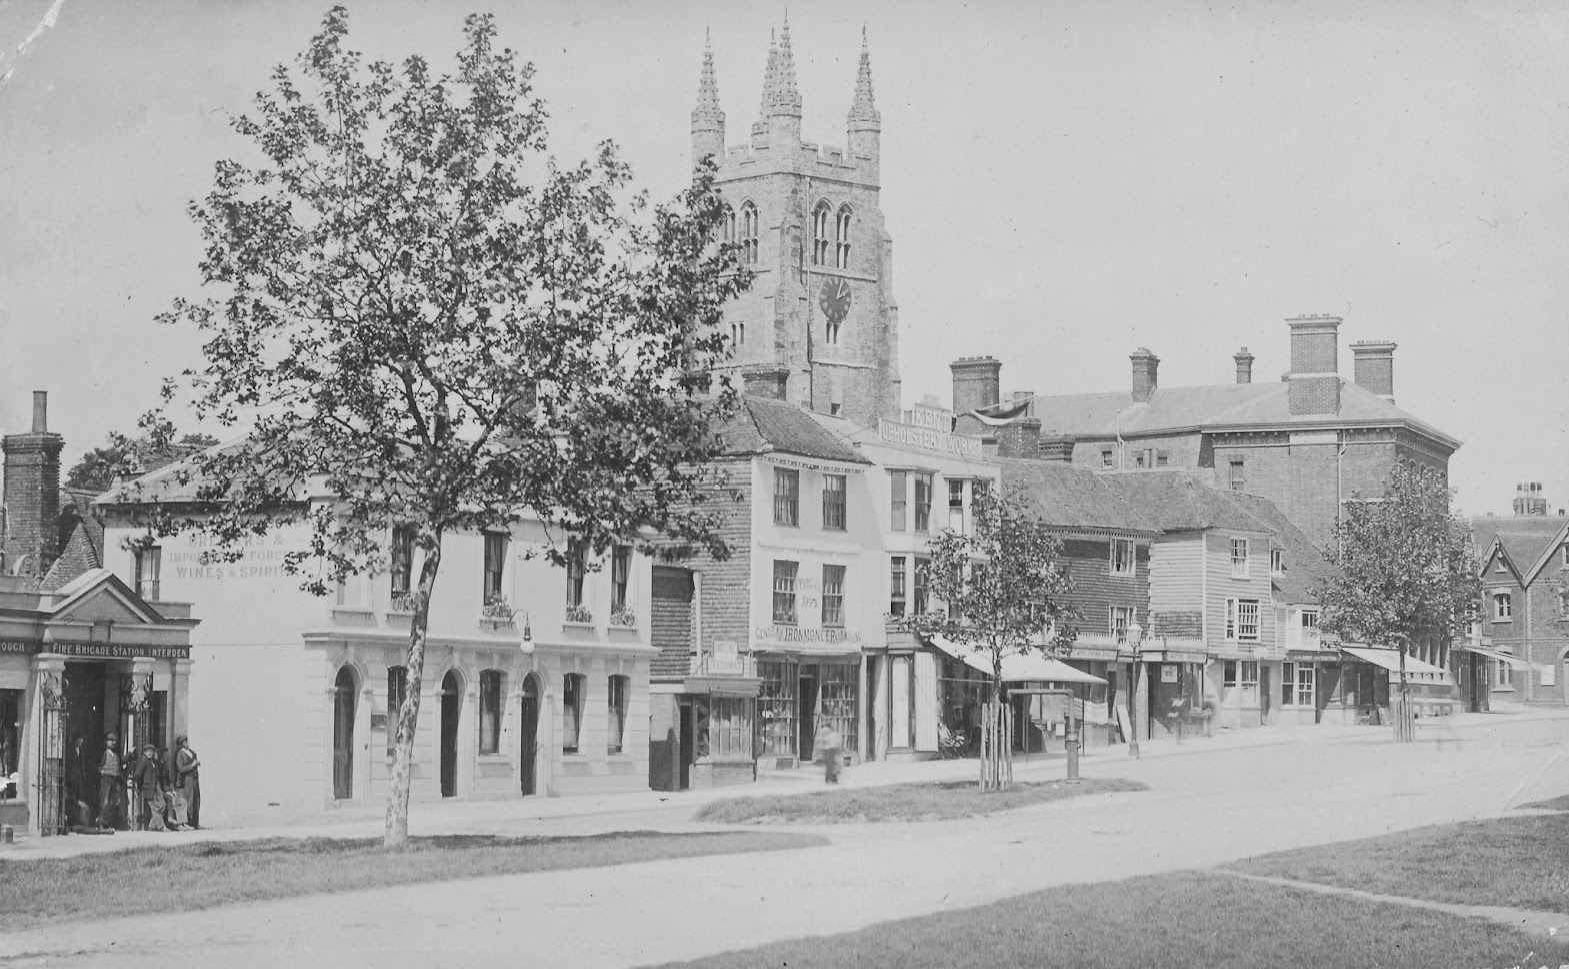 Tenterden Archive photos Church Road to Station Road Tenterden High Street